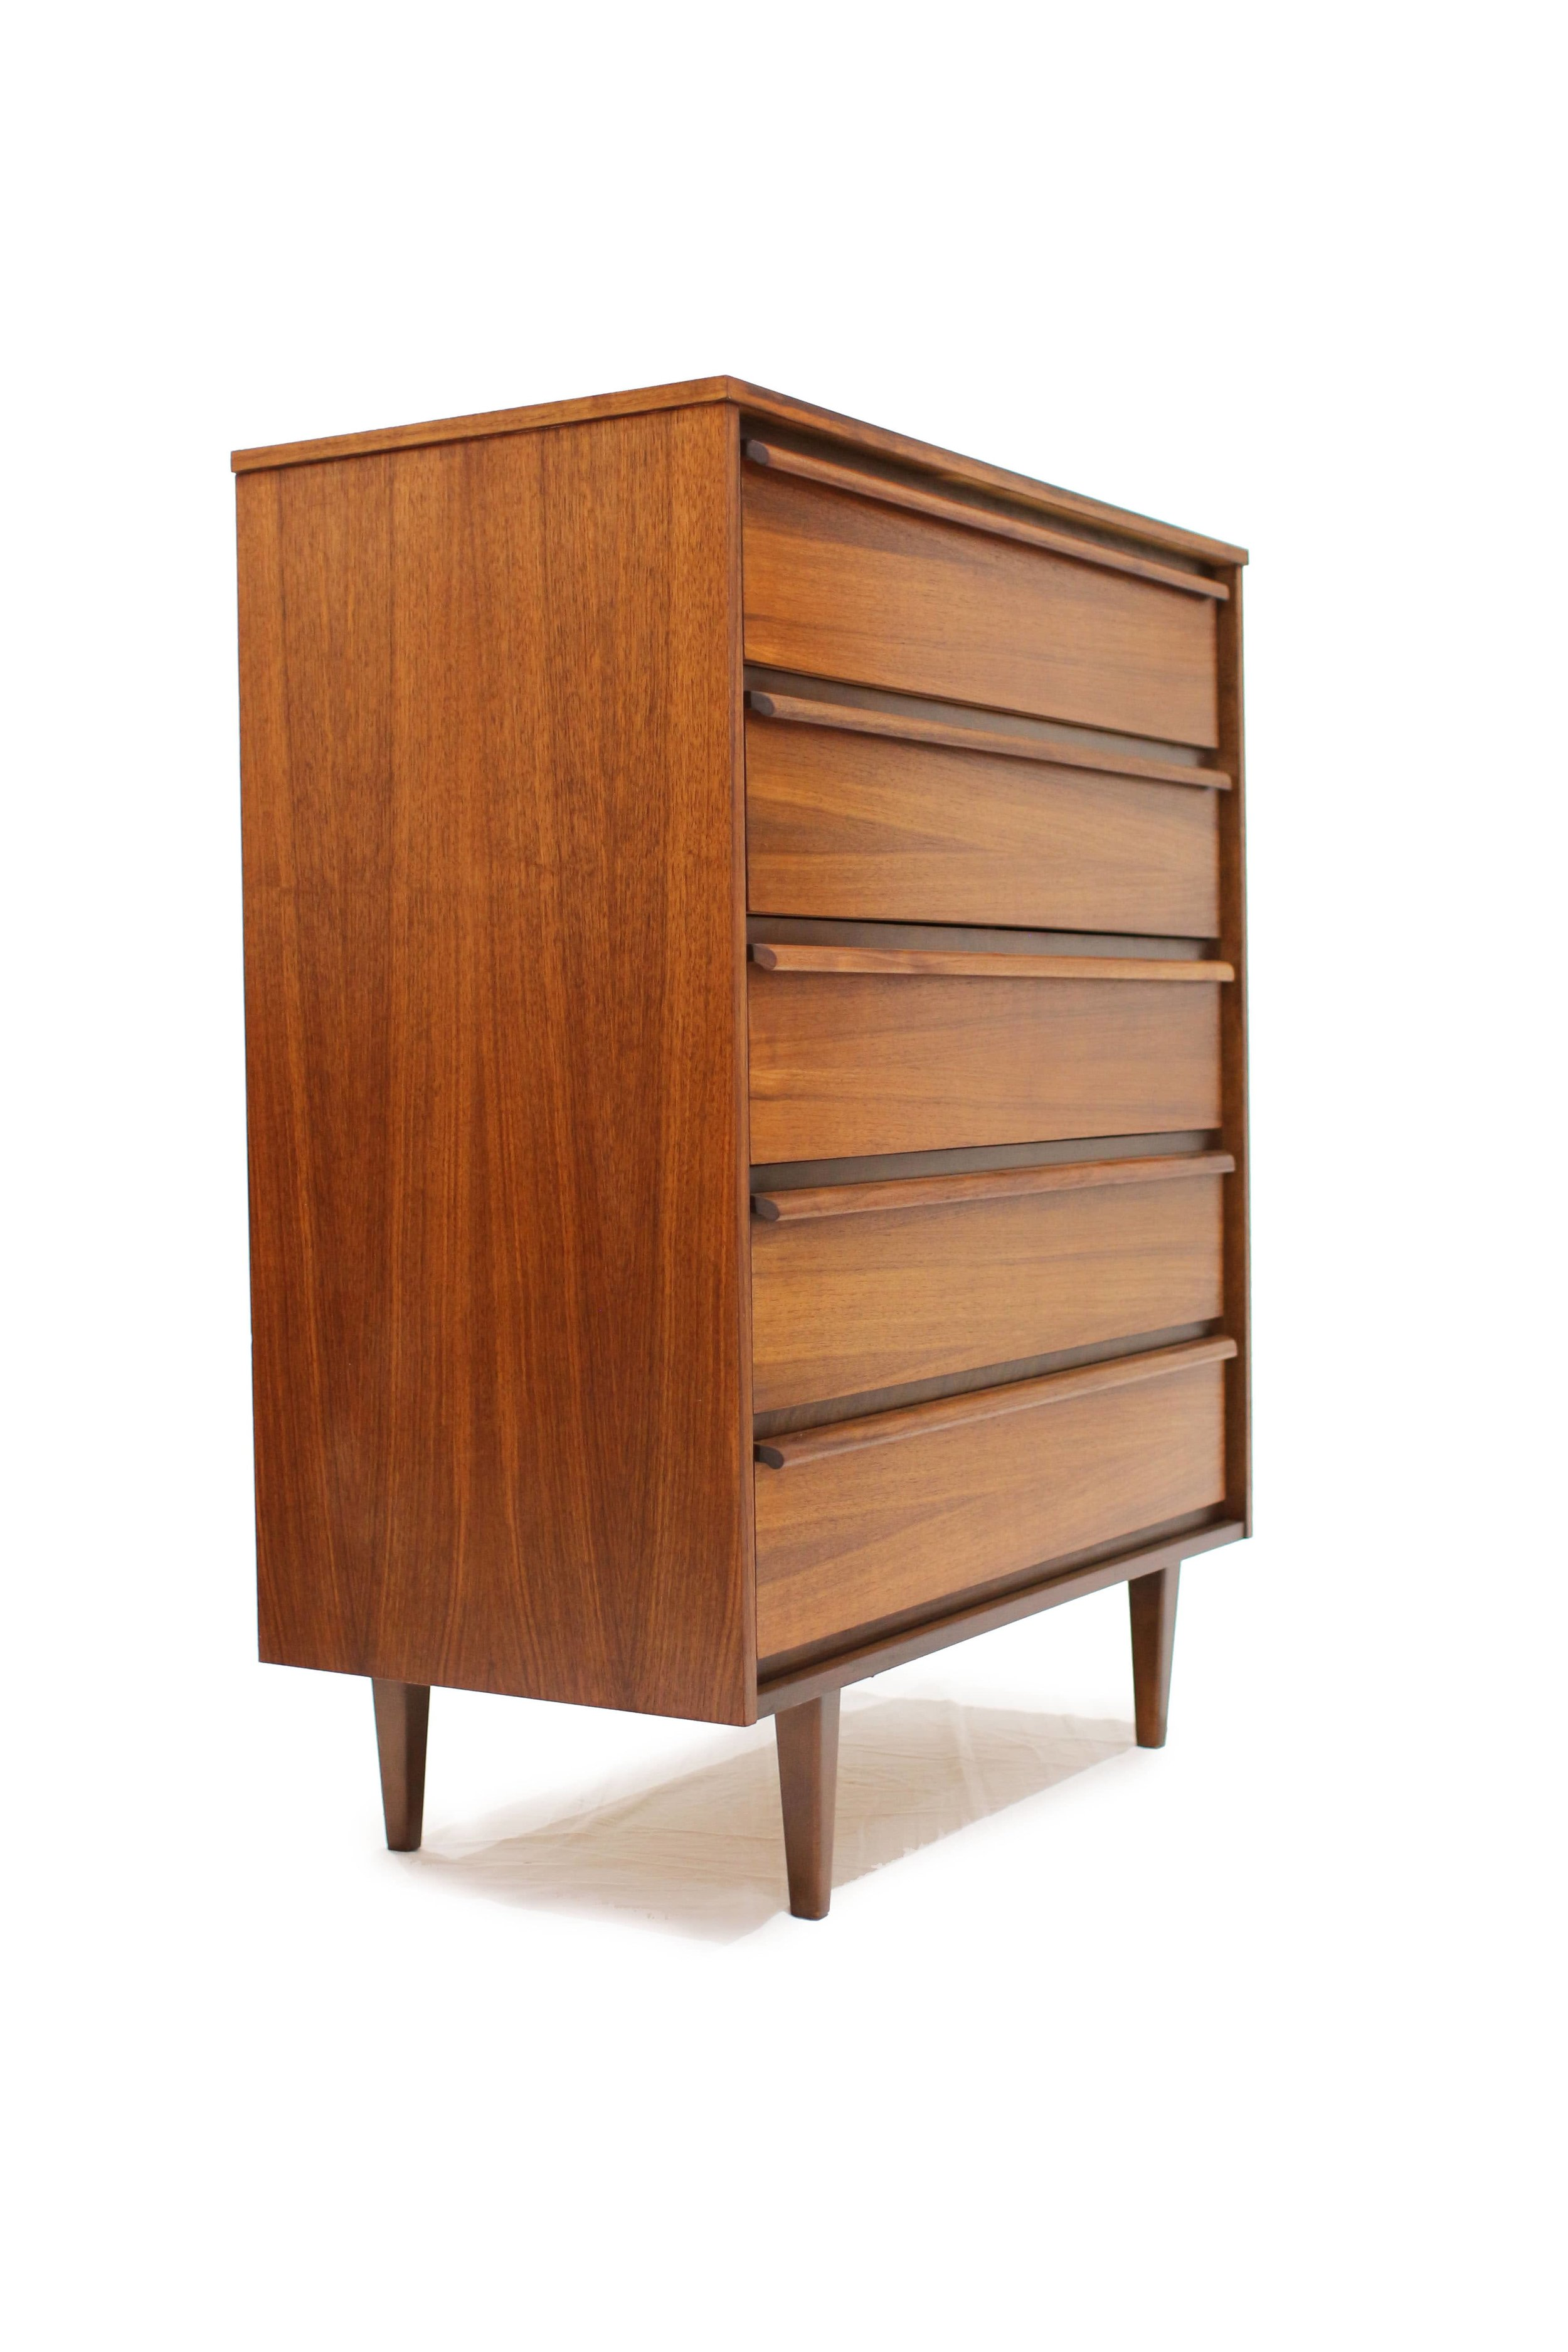 Sold Walnut 5 Drawer High Boy Dresser Furniture 1950 Teak Mid Century Modern Furniture Oshawa Toronto